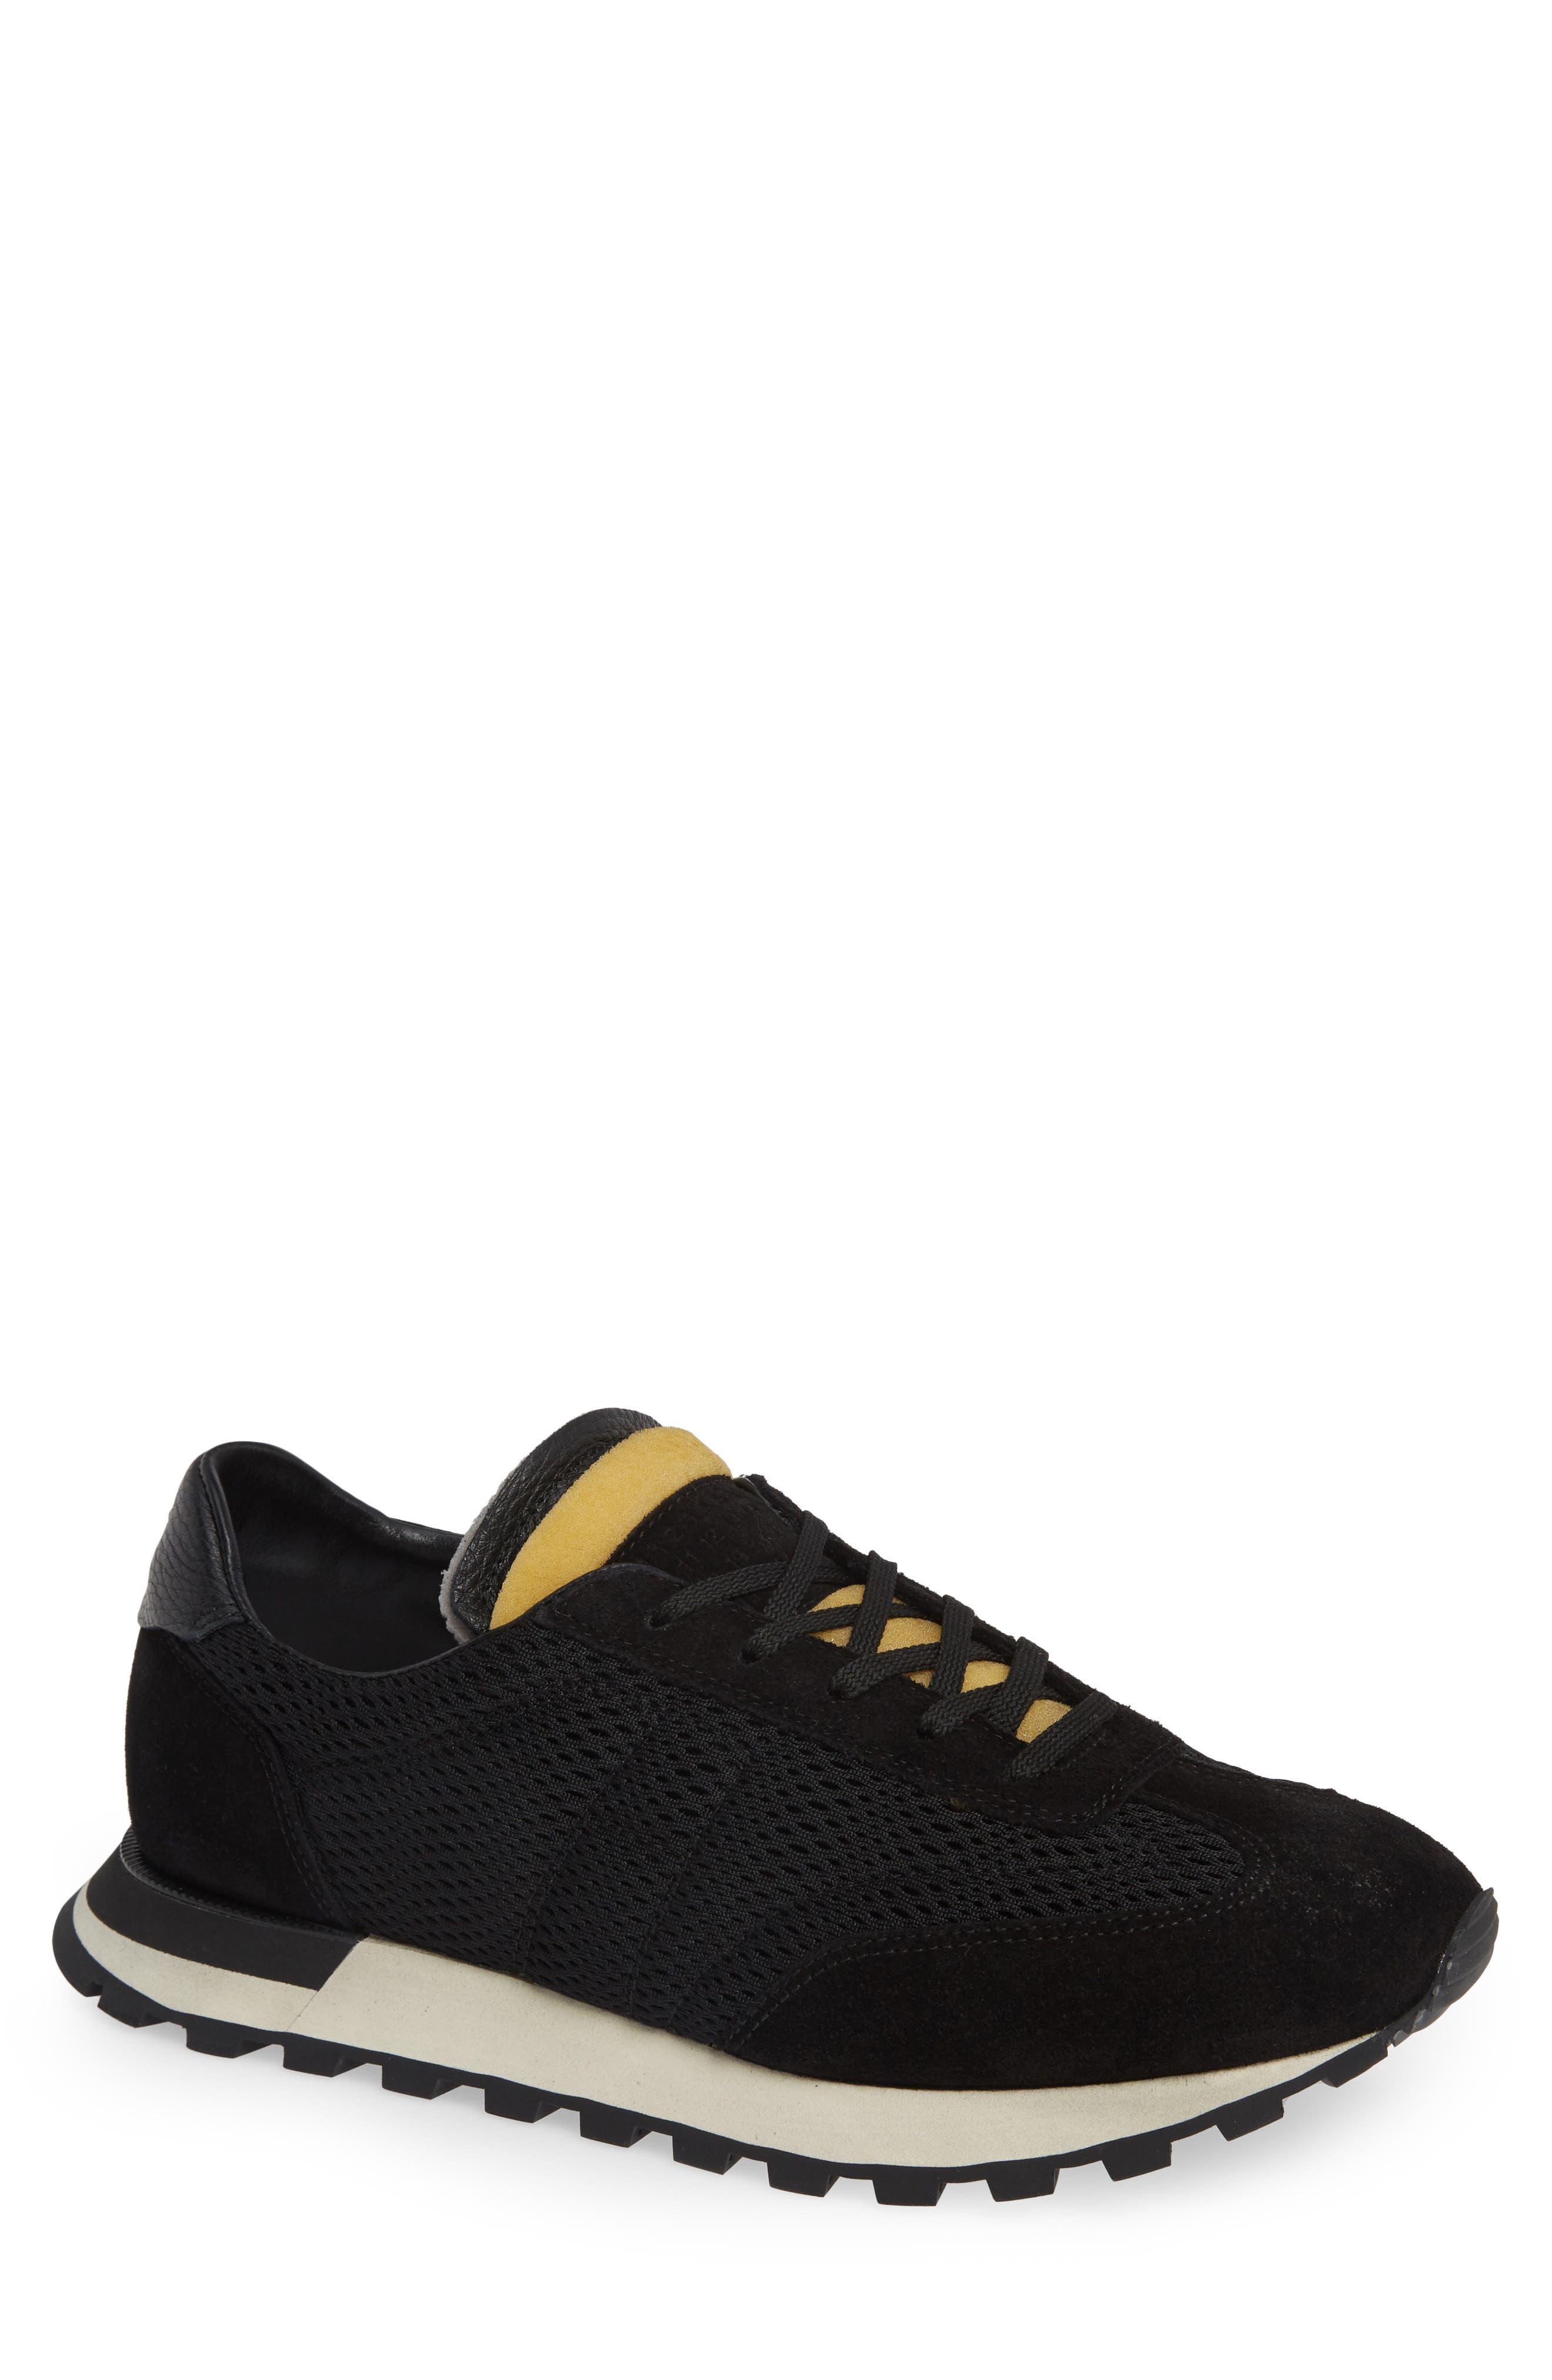 Maison Margiela Quilted Sneaker, Black